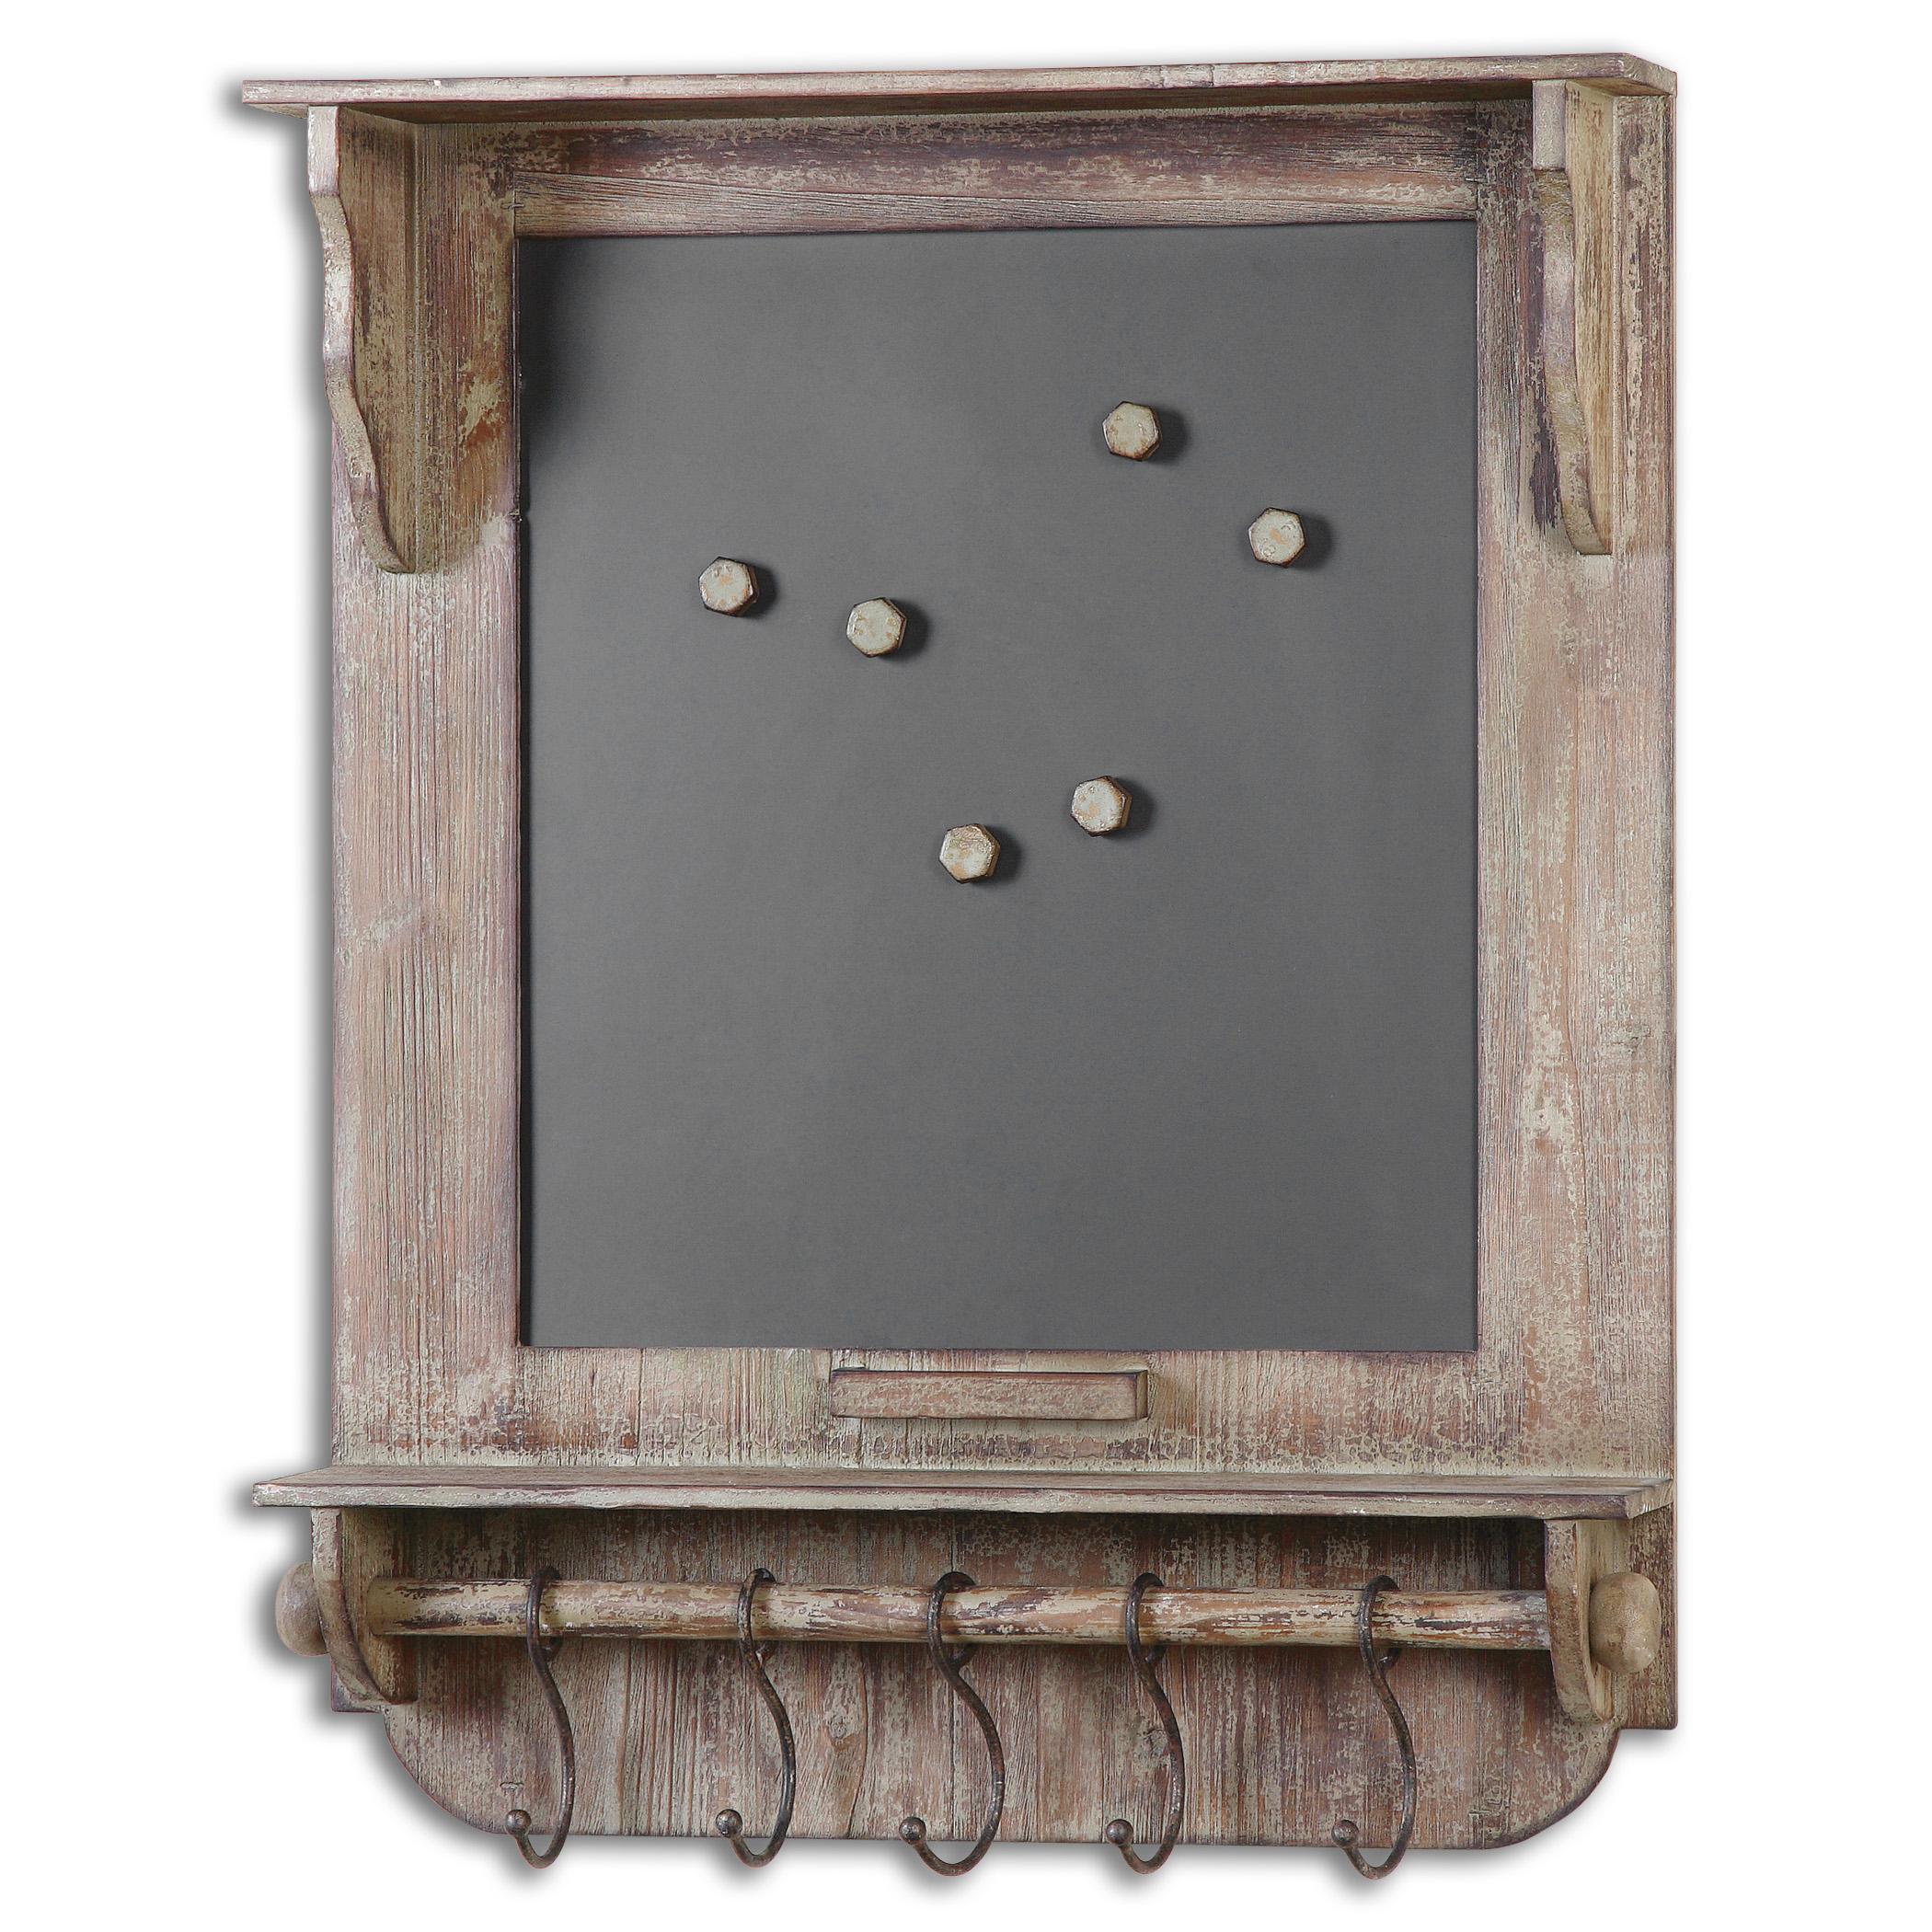 Uttermost Alternative Wall Decor Laelia Wooden Chalkboard - Item Number: 13878